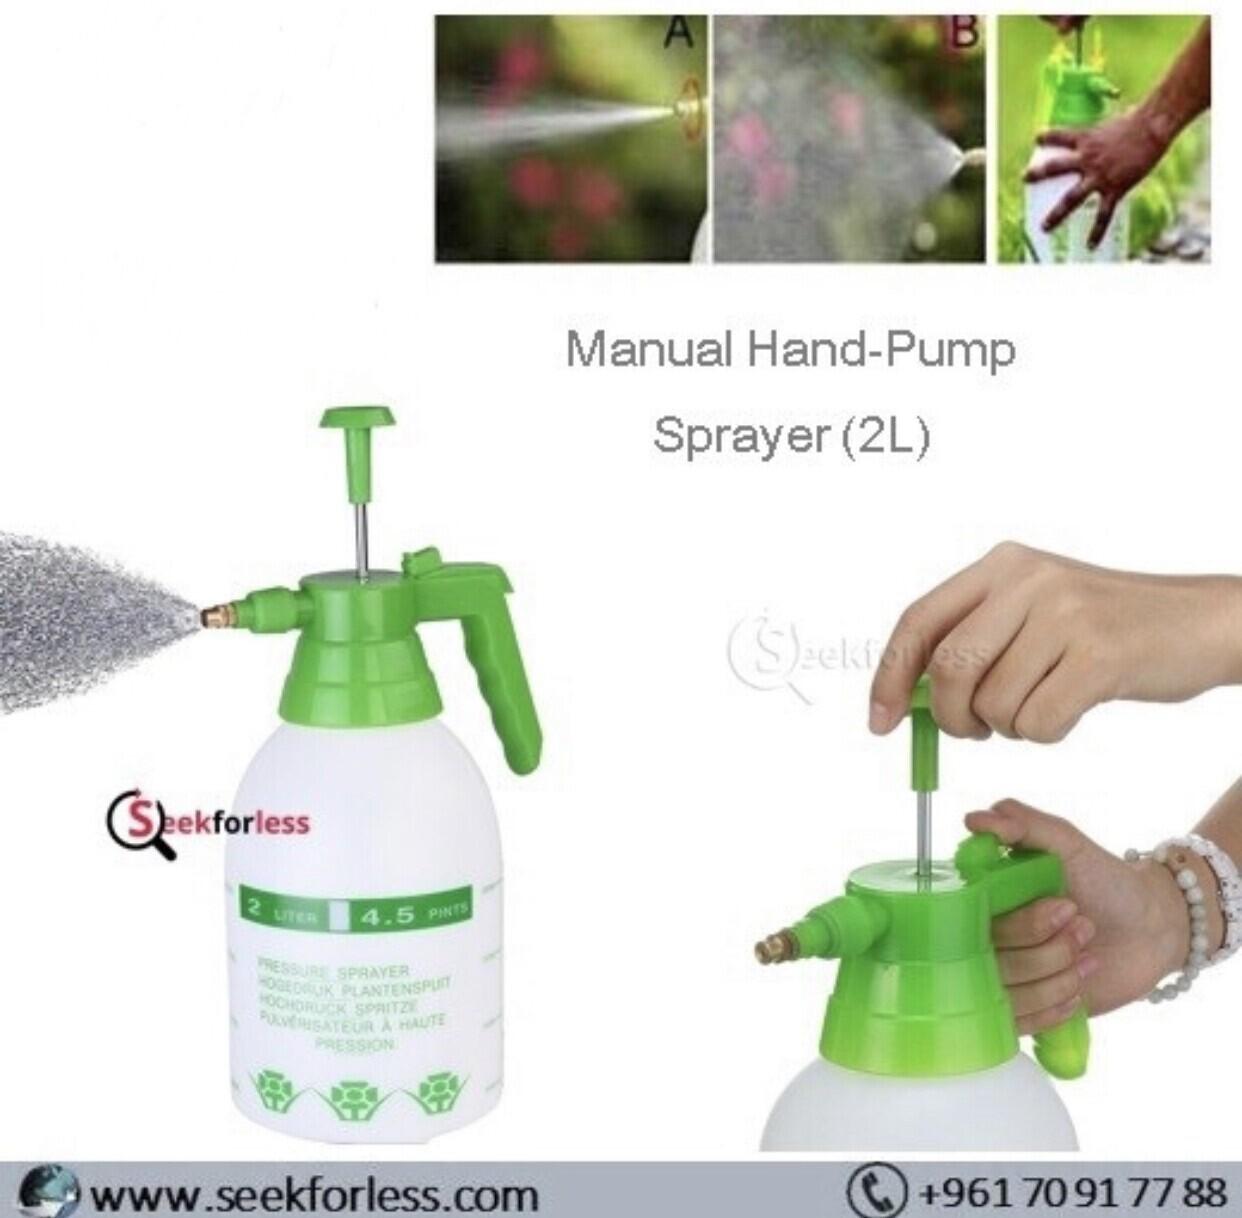 Hand-Pump Sprayer